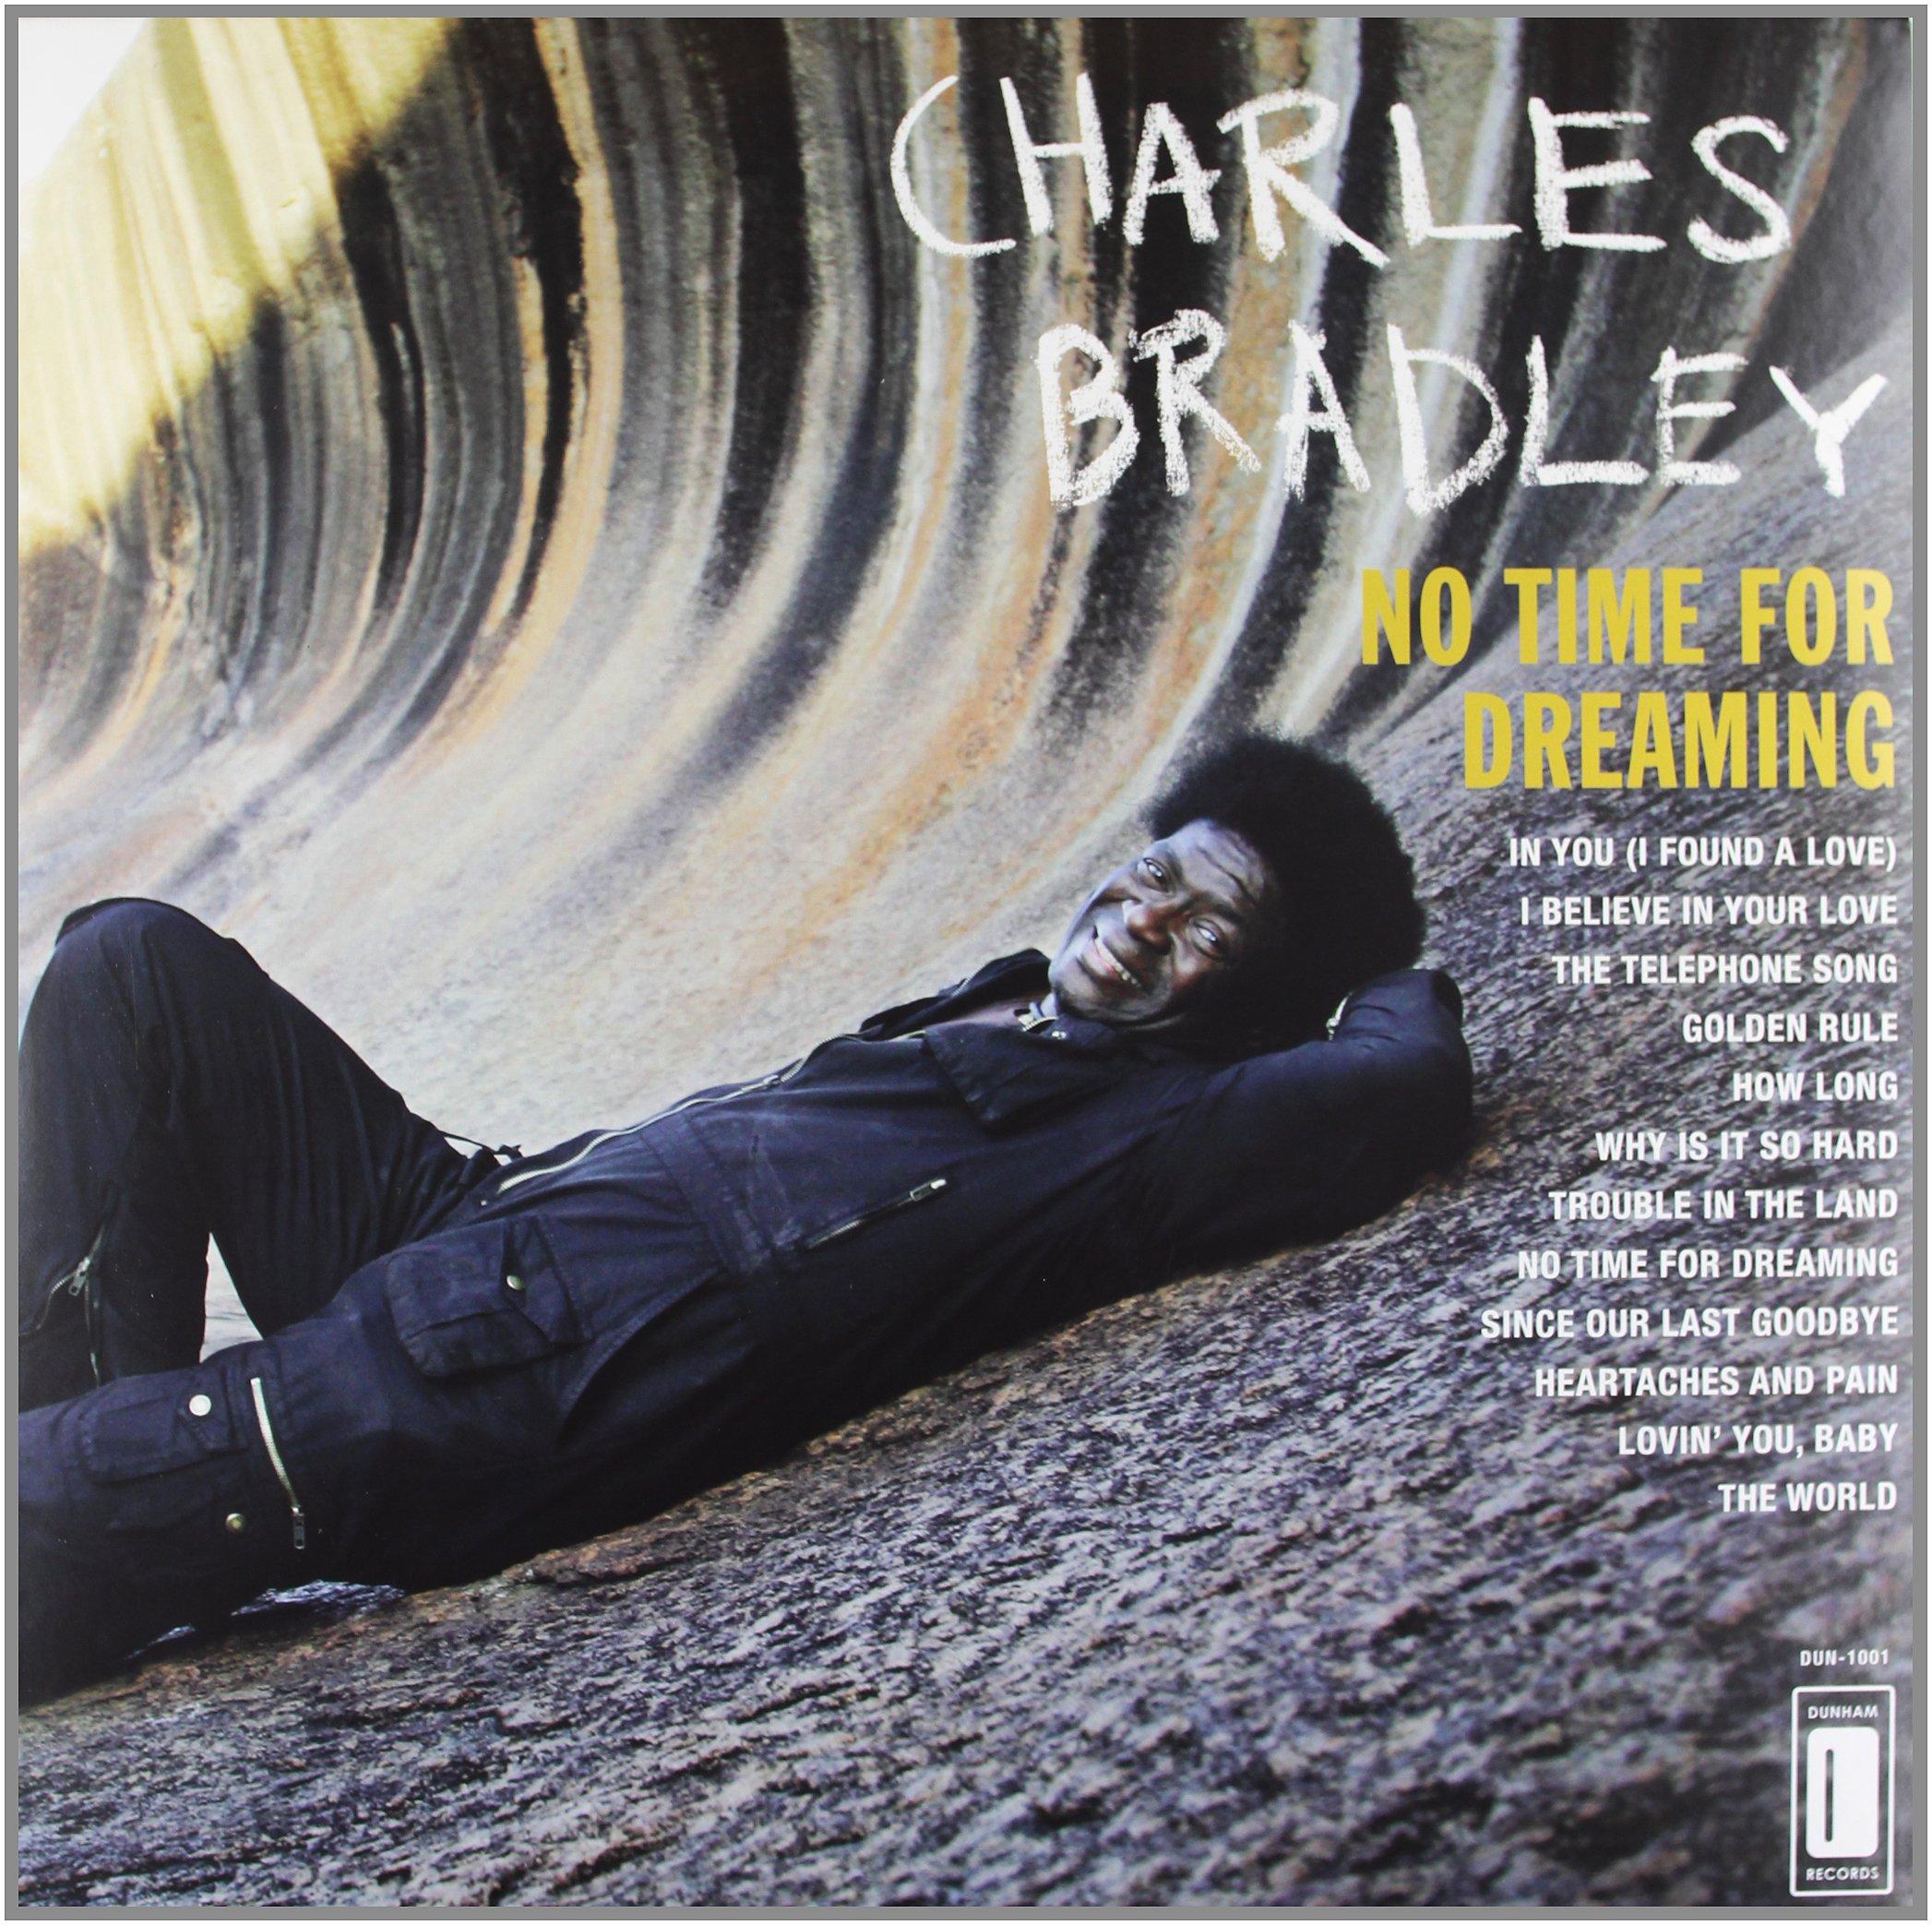 Vinilo : Charles Bradley - No Time For Dreaming (Digital Download Card)